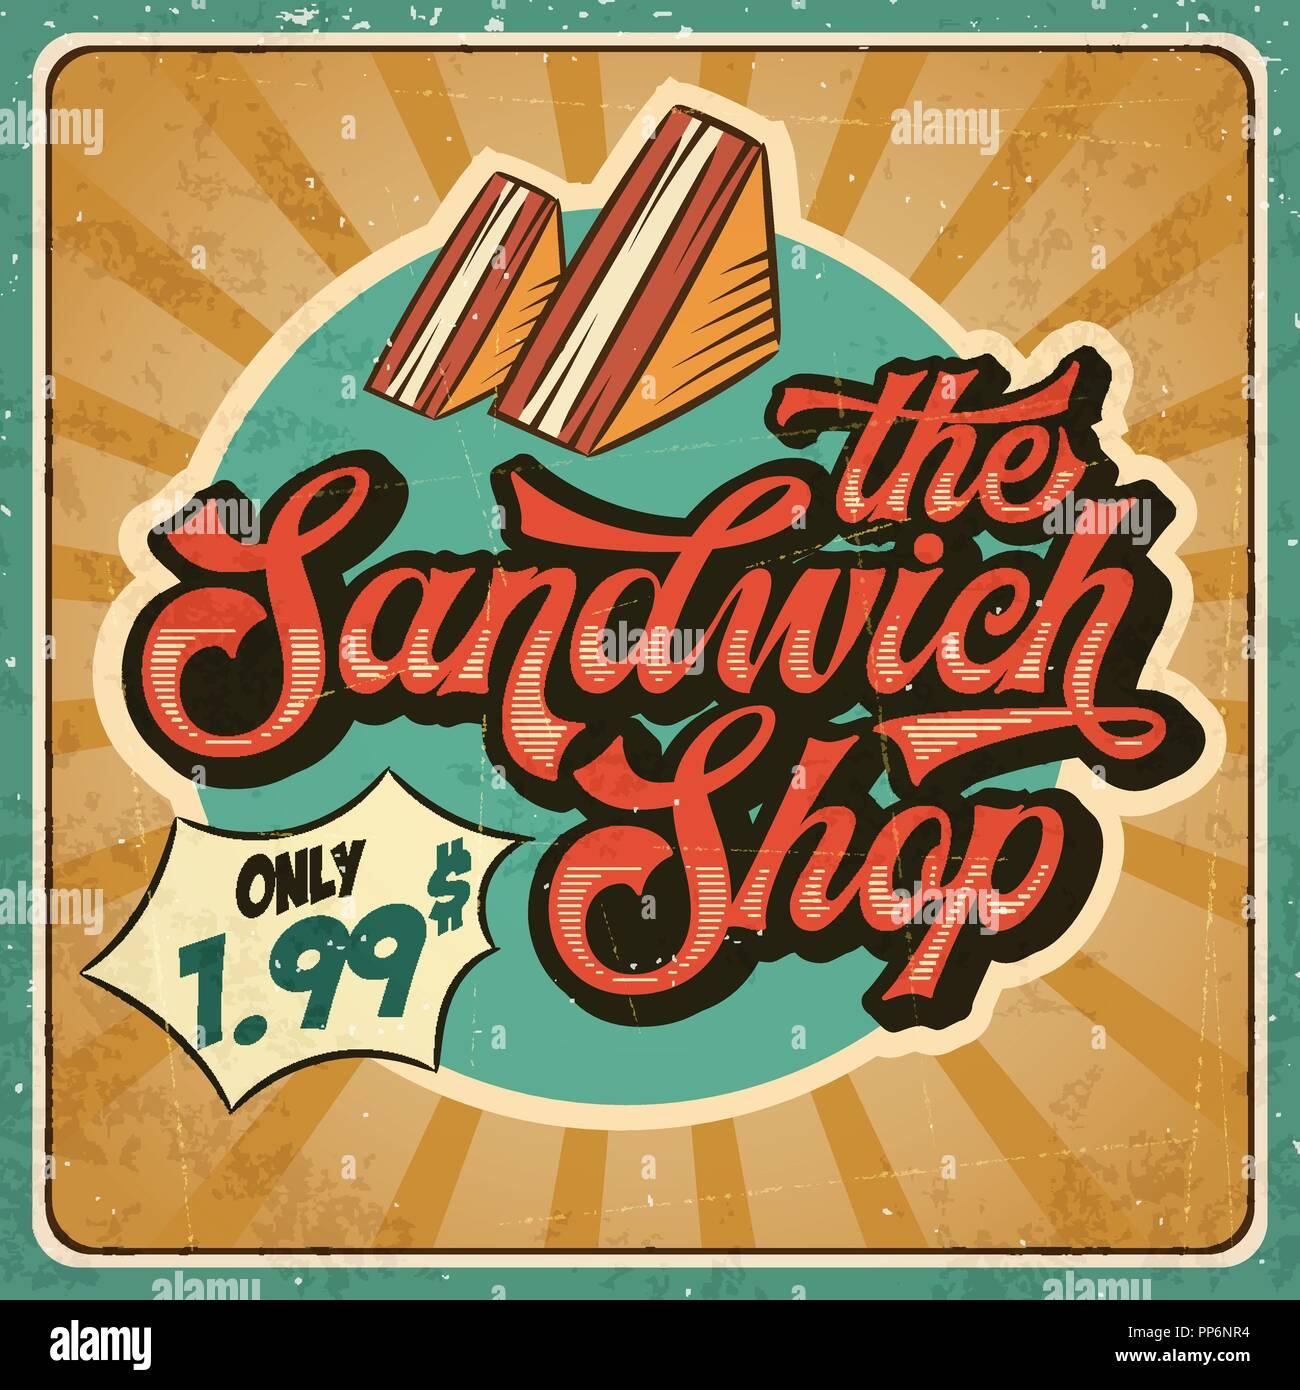 Retro Advertising Restaurant Sign For Sandwich Shop Vintage Poster Vector Eps10 Stock Vector Image Art Alamy